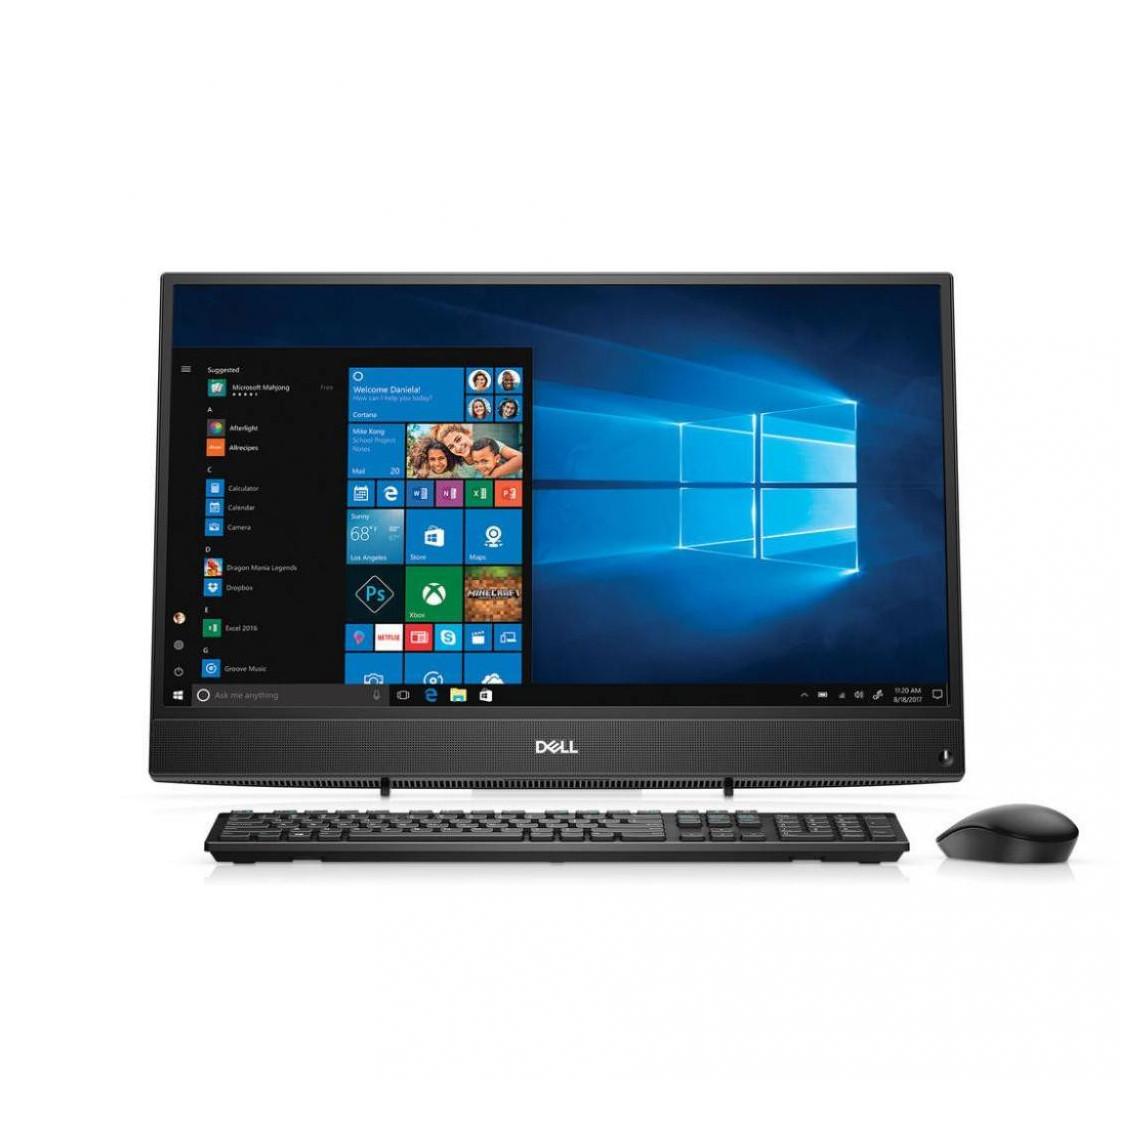 Моноблок Dell Inspiron 3280 Intel Core i3 2 ядра 8 Гб HDD 1Тб Windows 10 210-ARLI_1